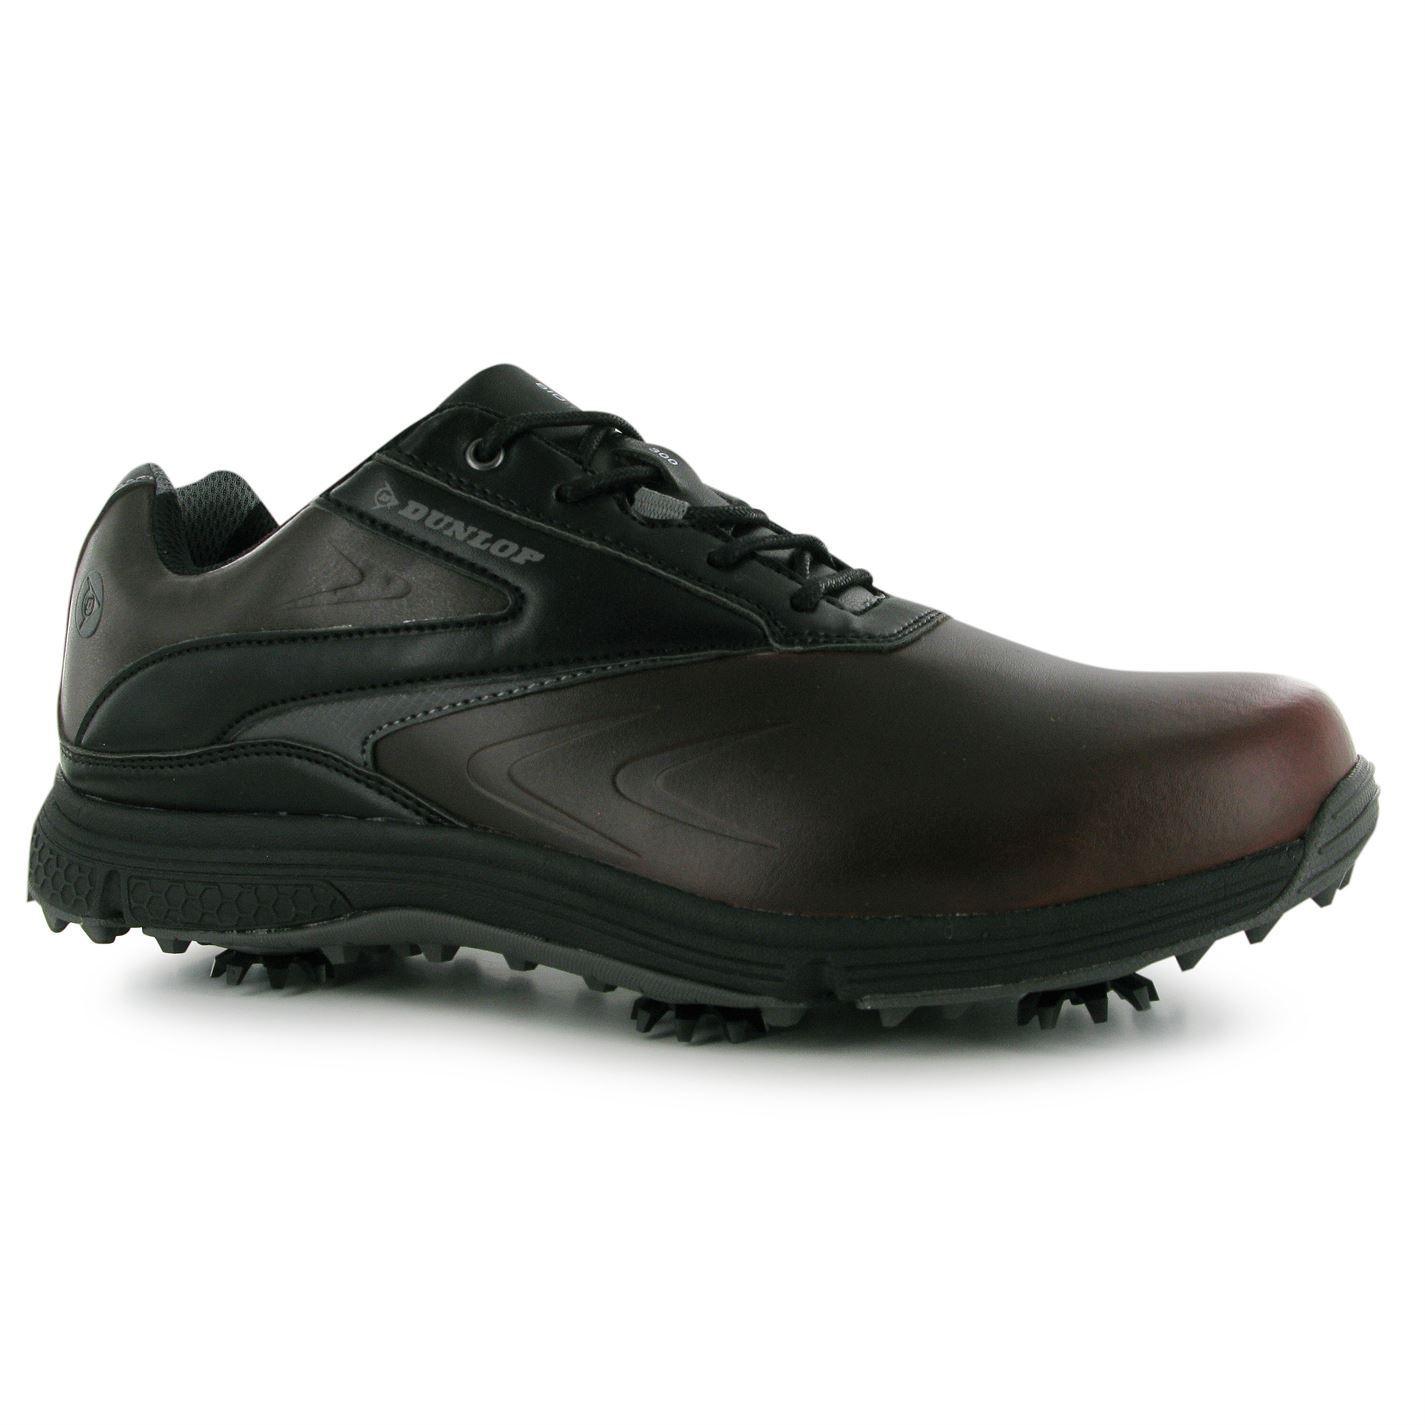 Dunlop Waterproof Golf Shoes